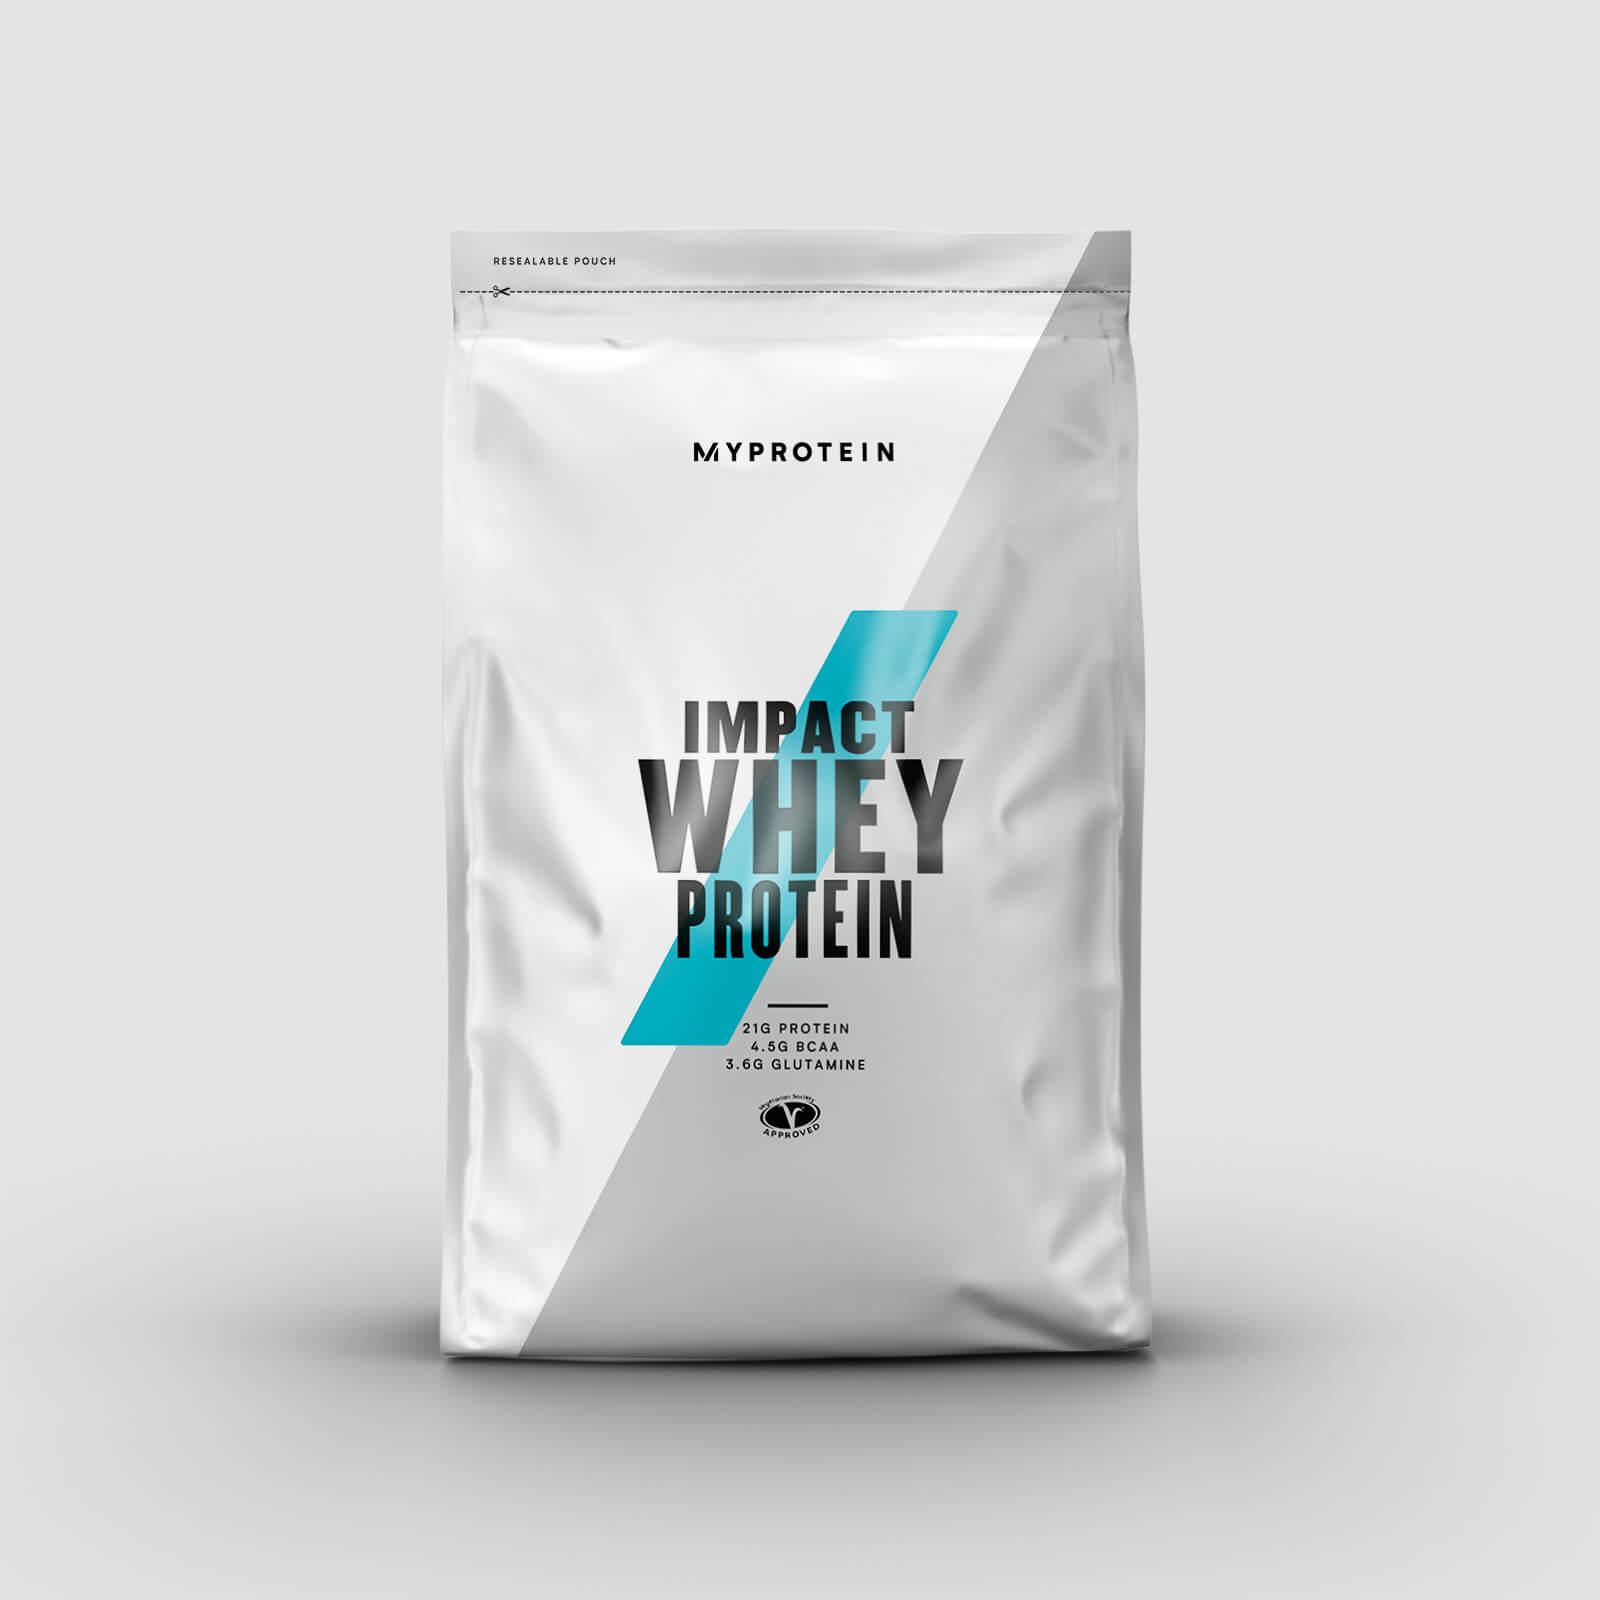 Myprotein Impact Whey Protein - 1kg - Cioccolato e arancia